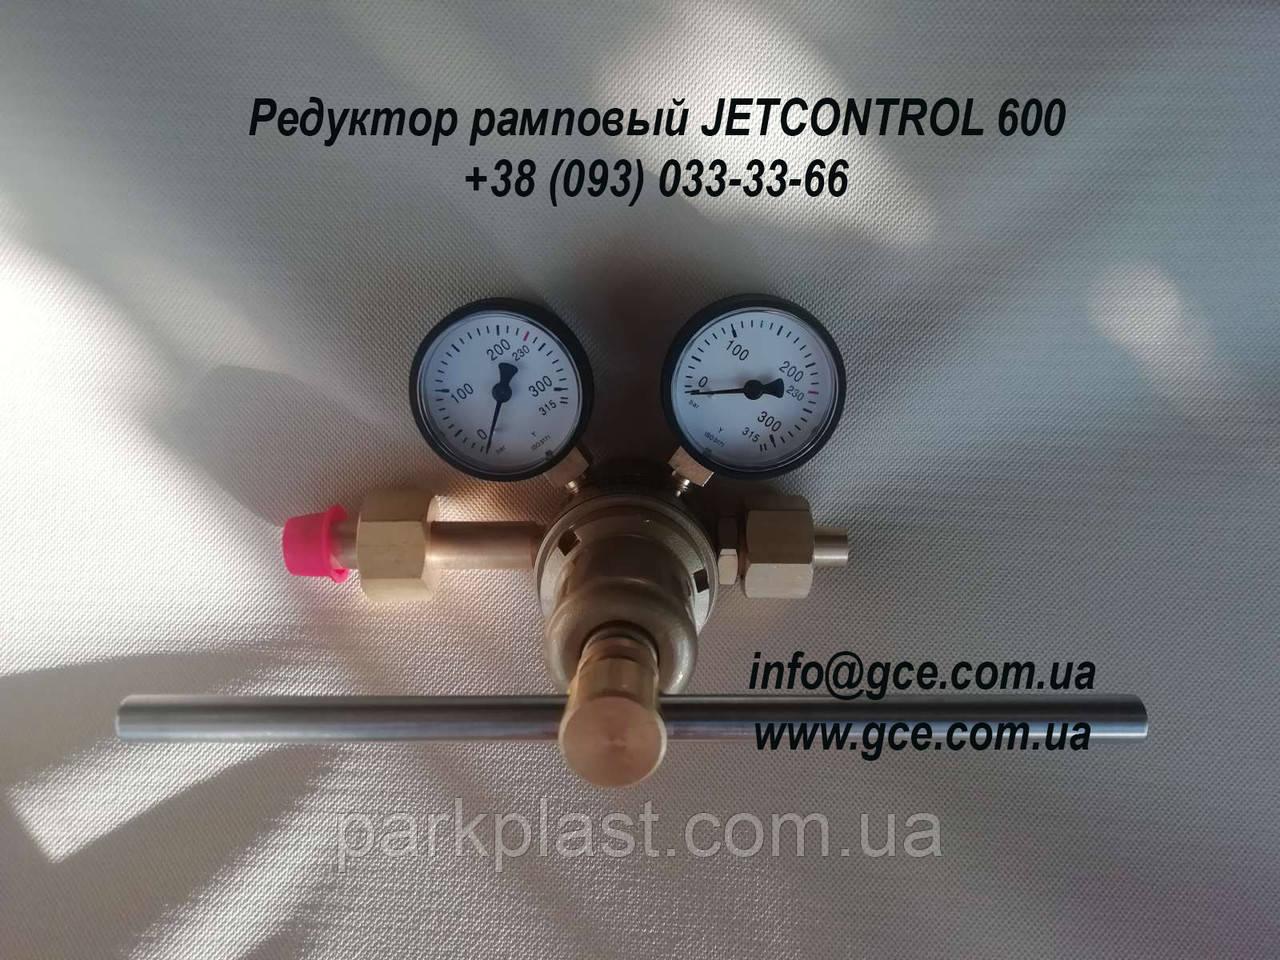 Редуктор рамповый JETCONTROL 600 GCE, GCE Украина